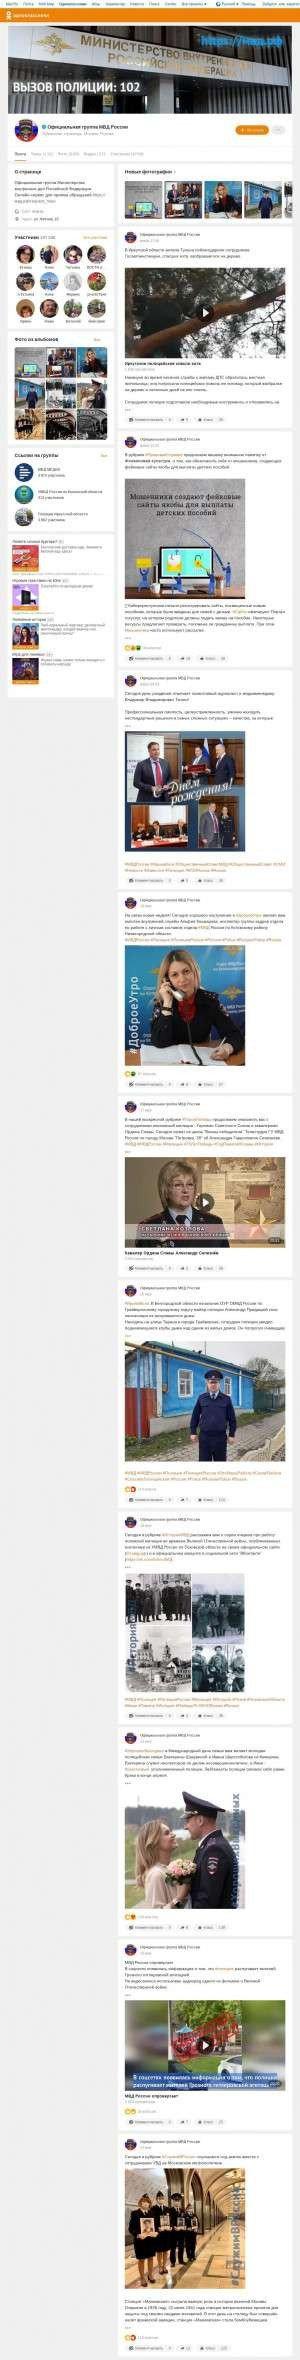 Предпросмотр для ok.ru — УВД